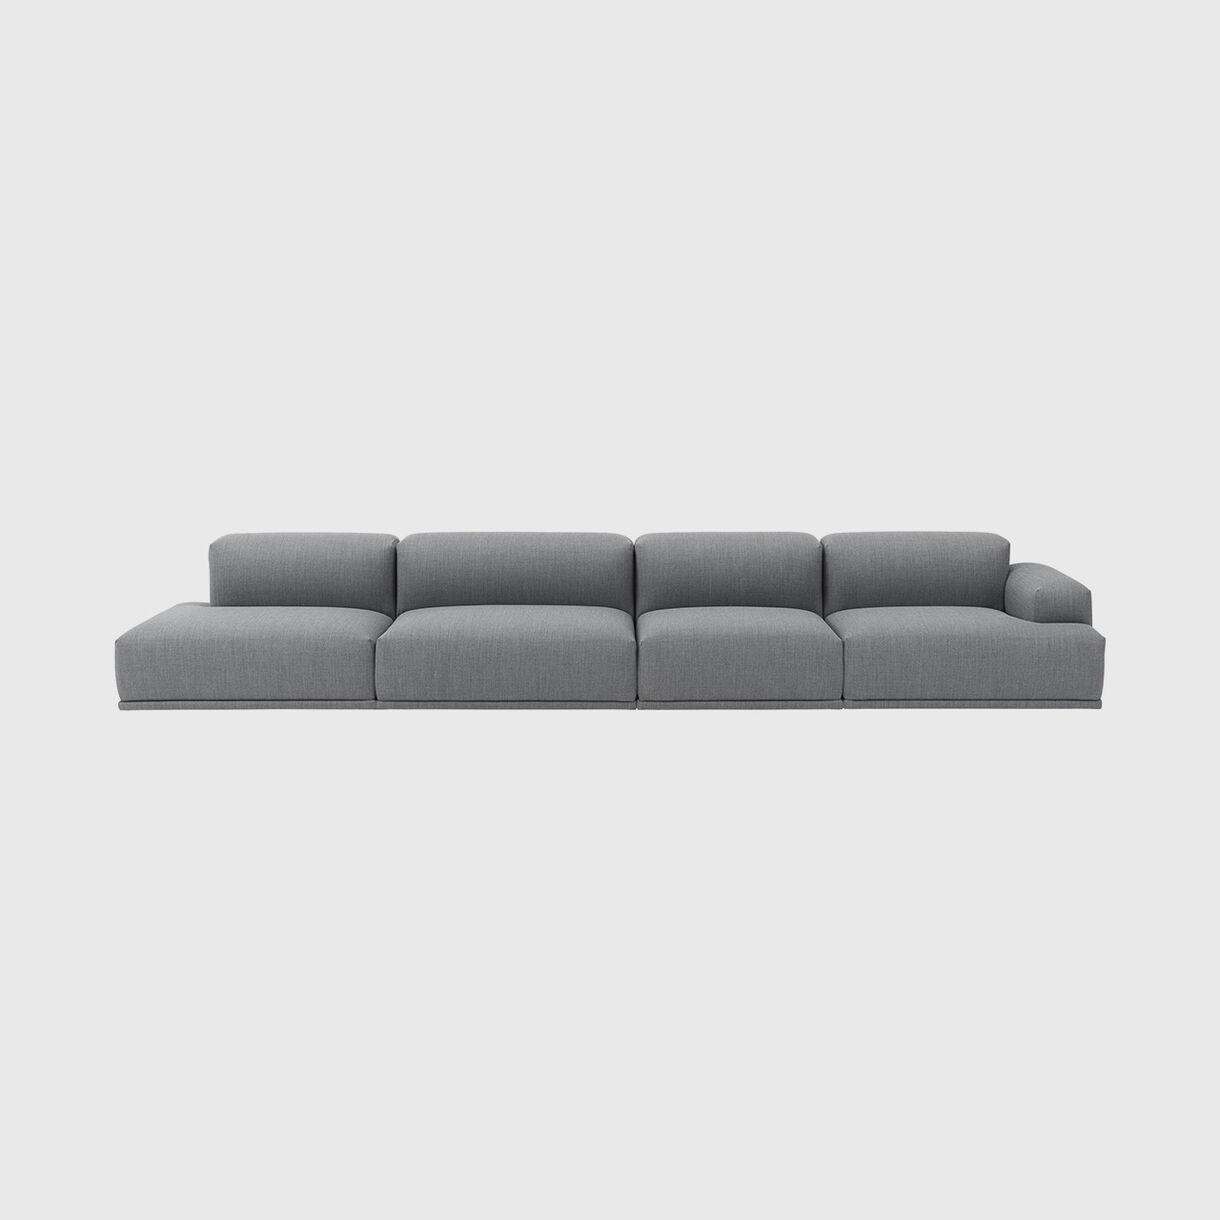 Connect Modular Sofa, 4 Seater, Fiord 151